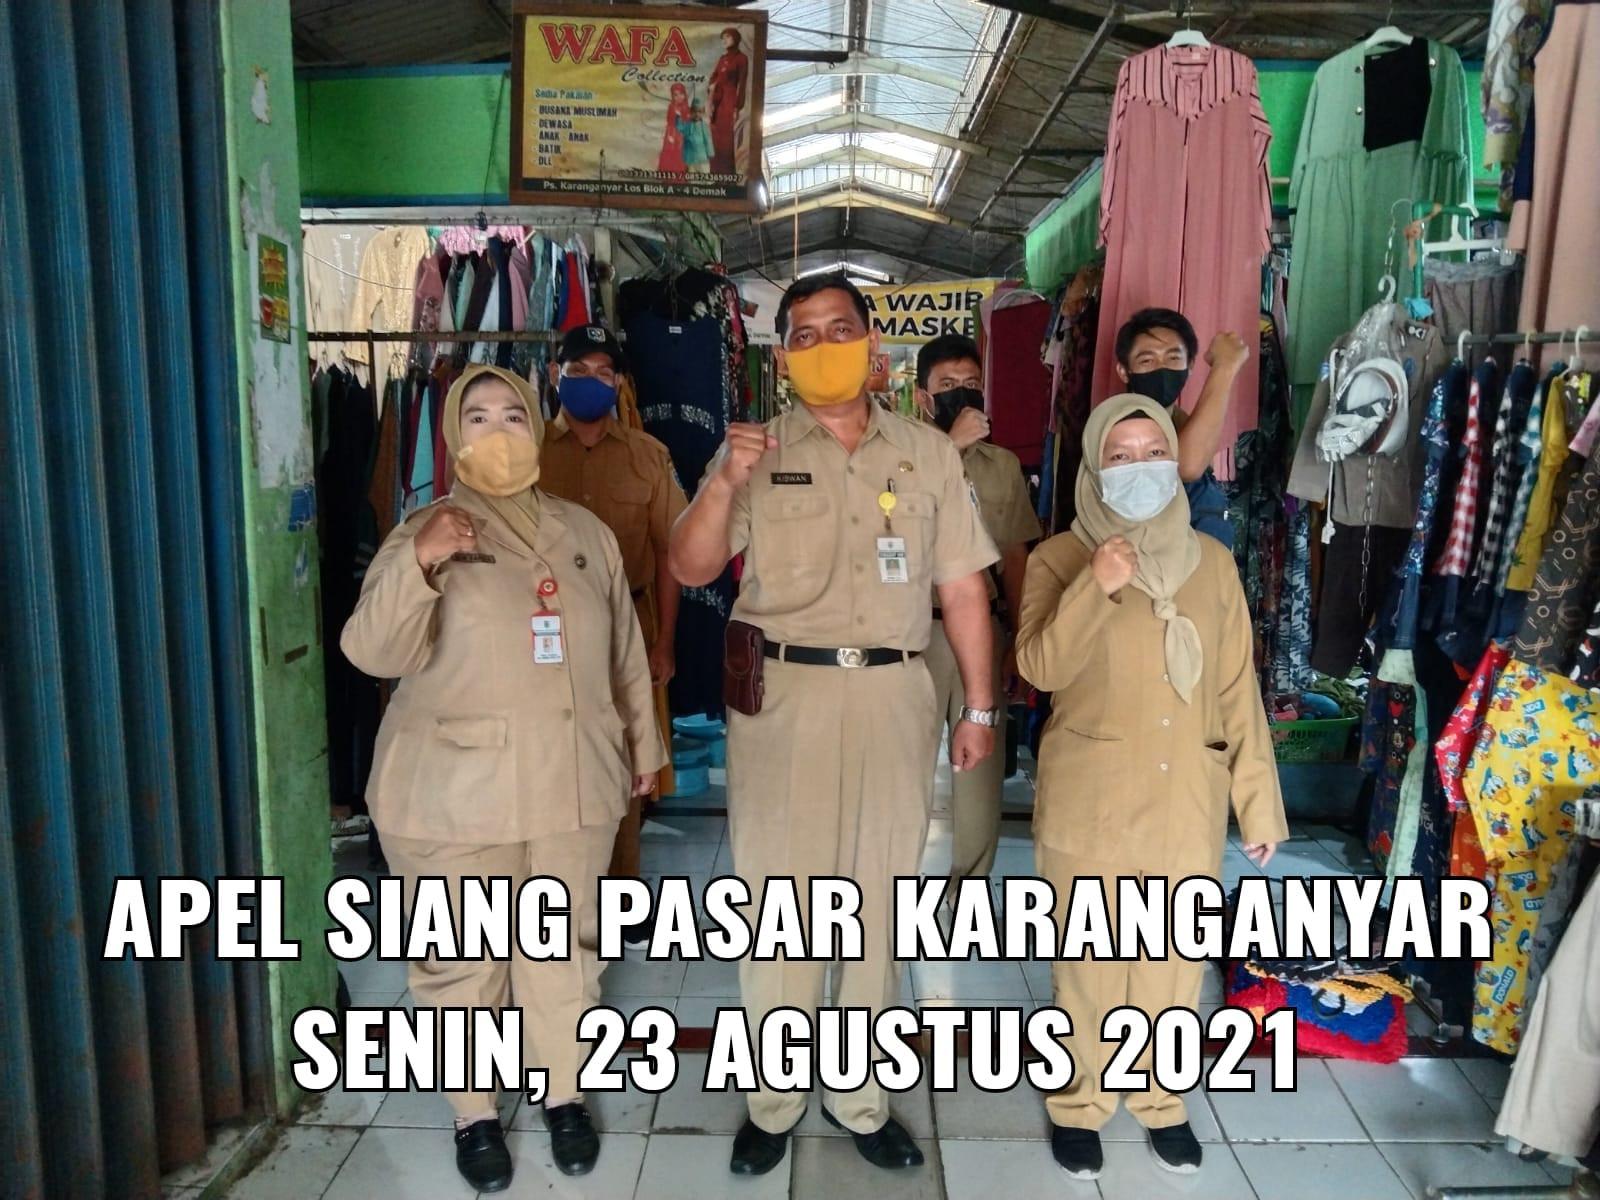 Penjagaan Pasar DI UPTD Paswil V Pasar Karanganyar Serta Apel Pagi Protokol Kesehatan